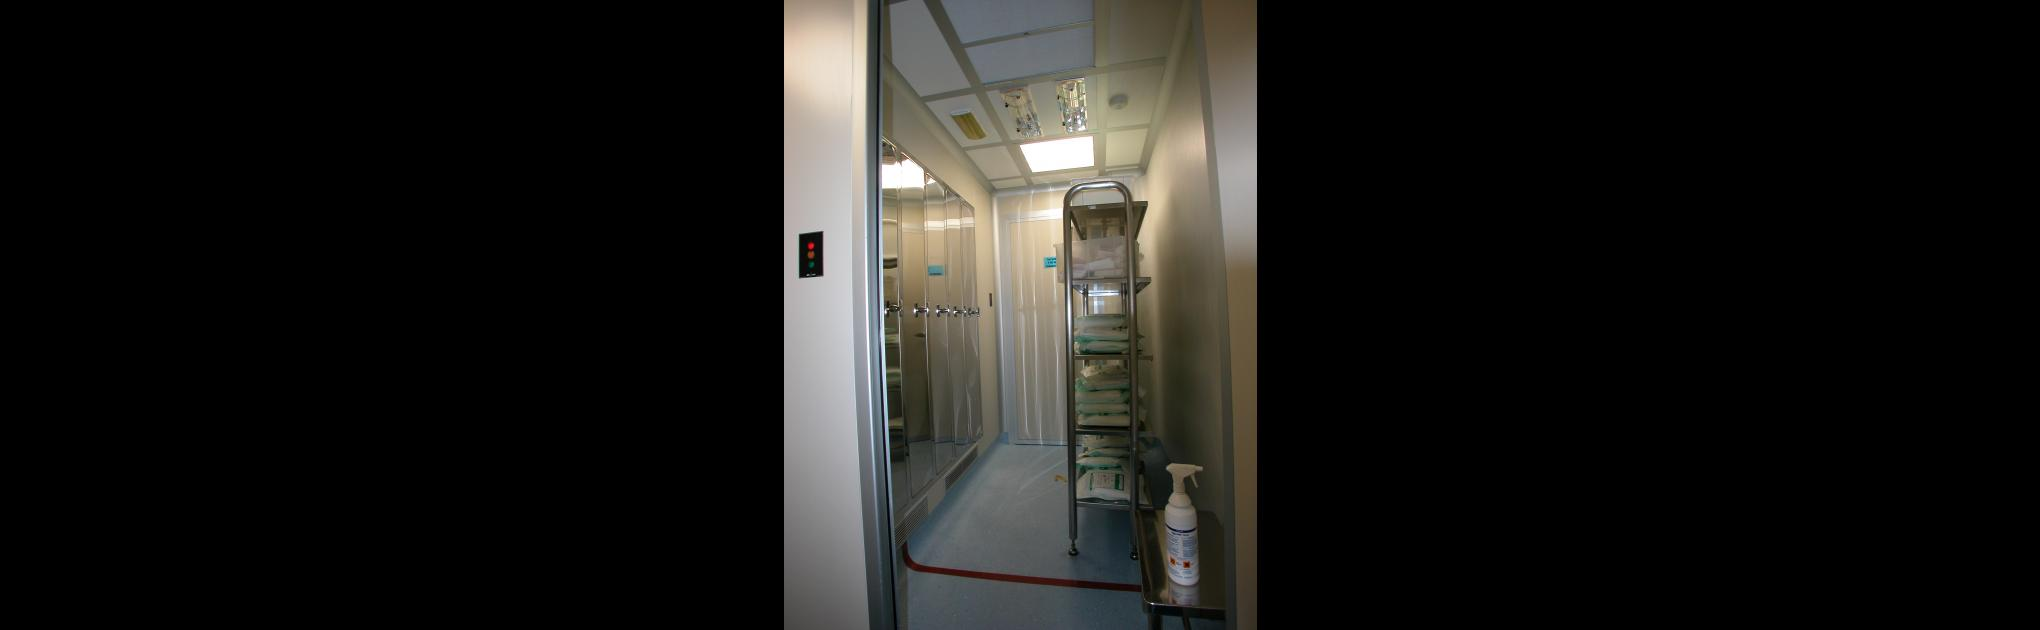 UV-DIRECT в поликлинике